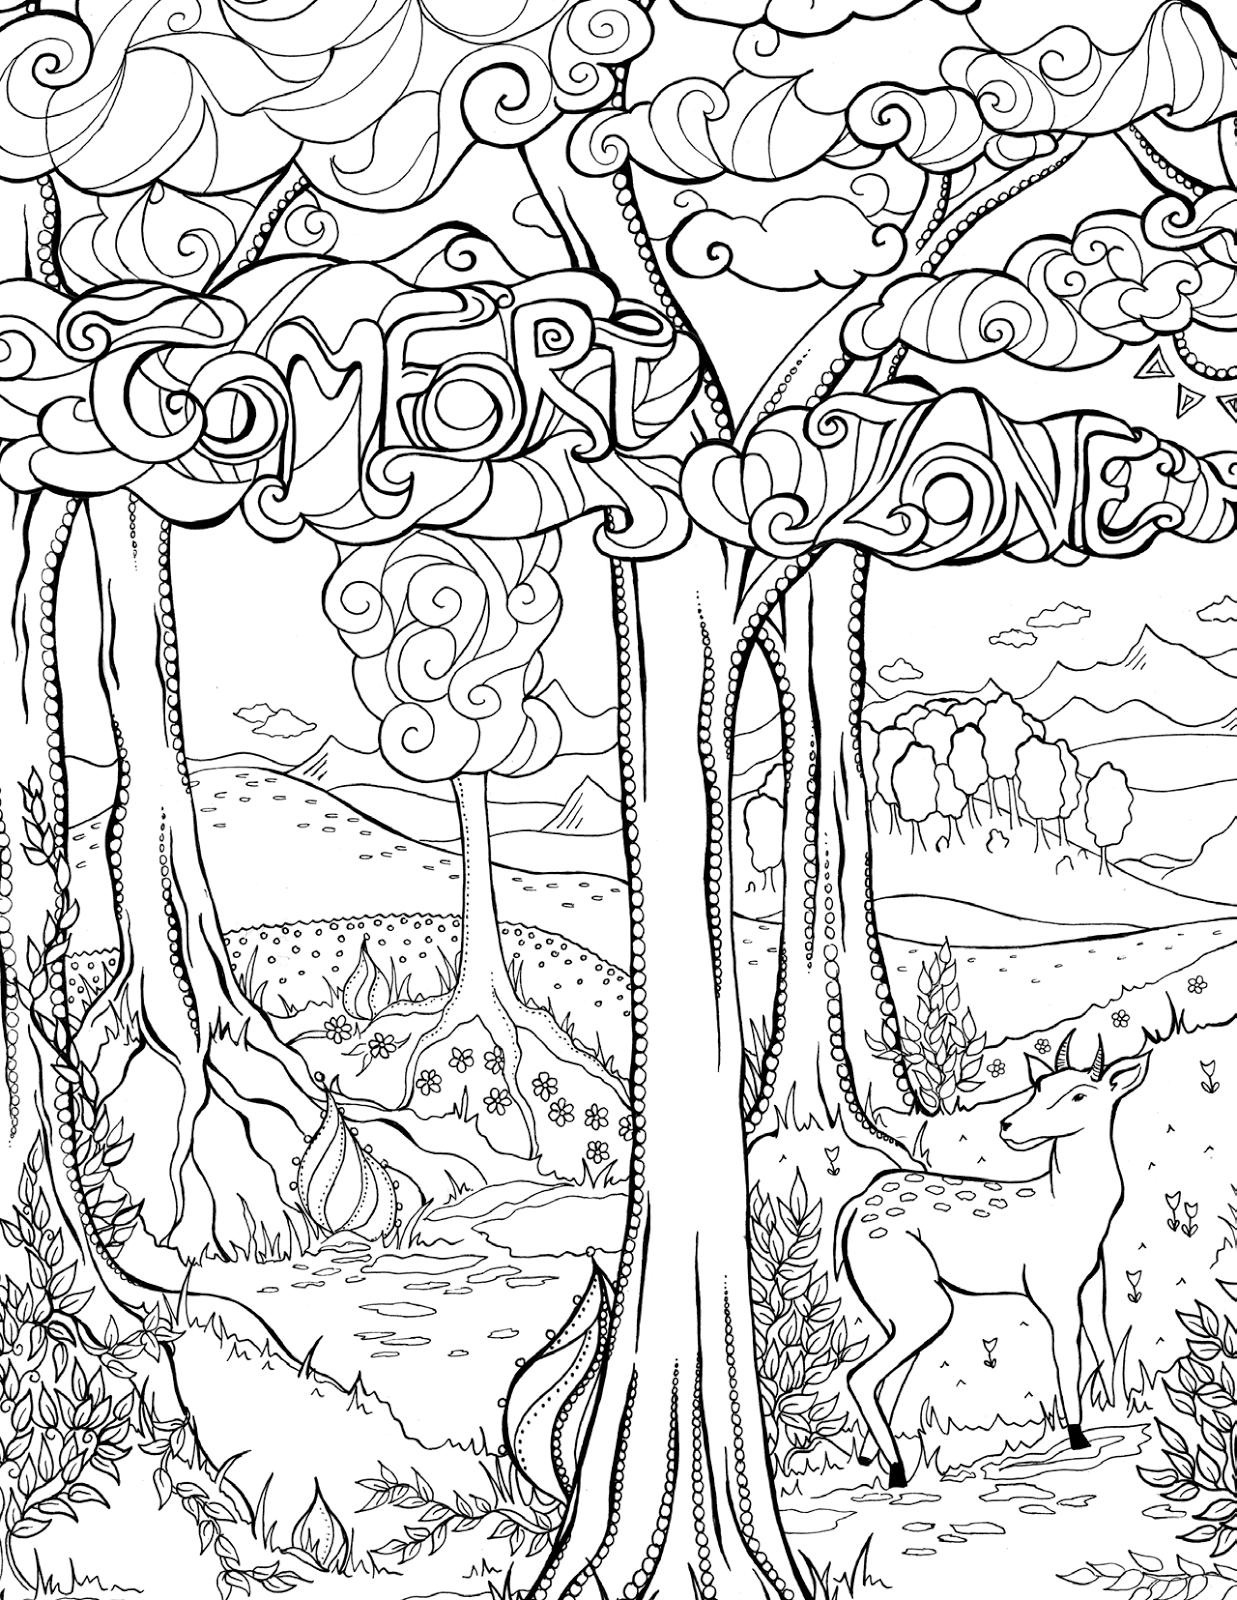 Valspar coloring book